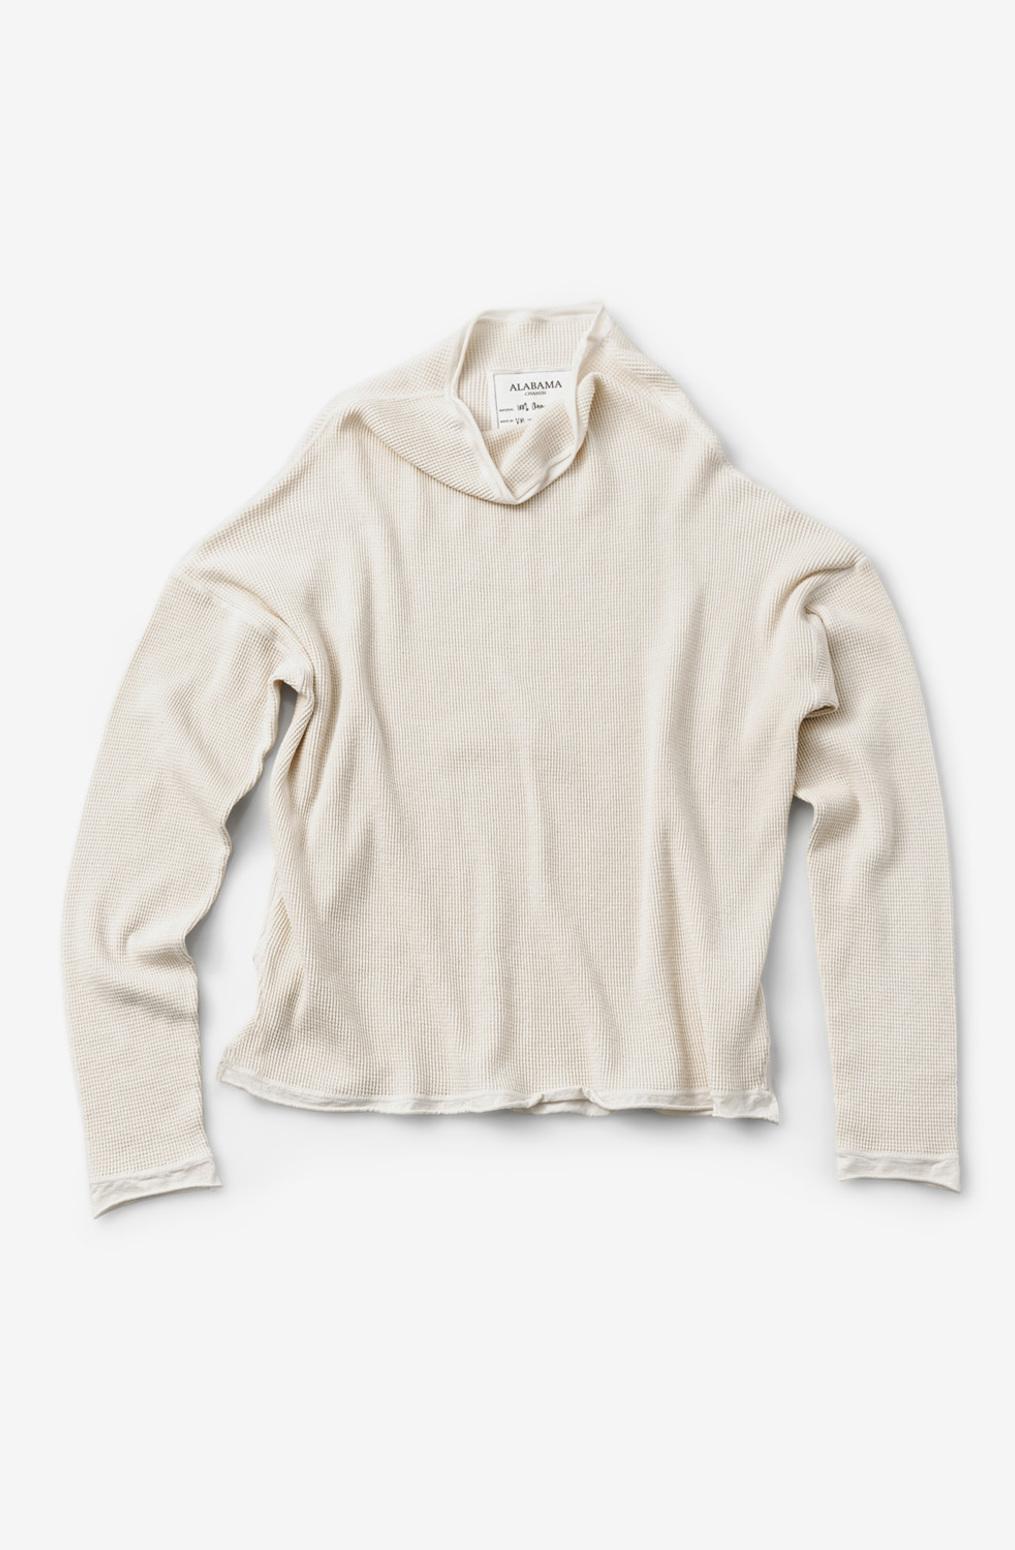 Alabama chanin womens organic cotton waffle sweatshirt top